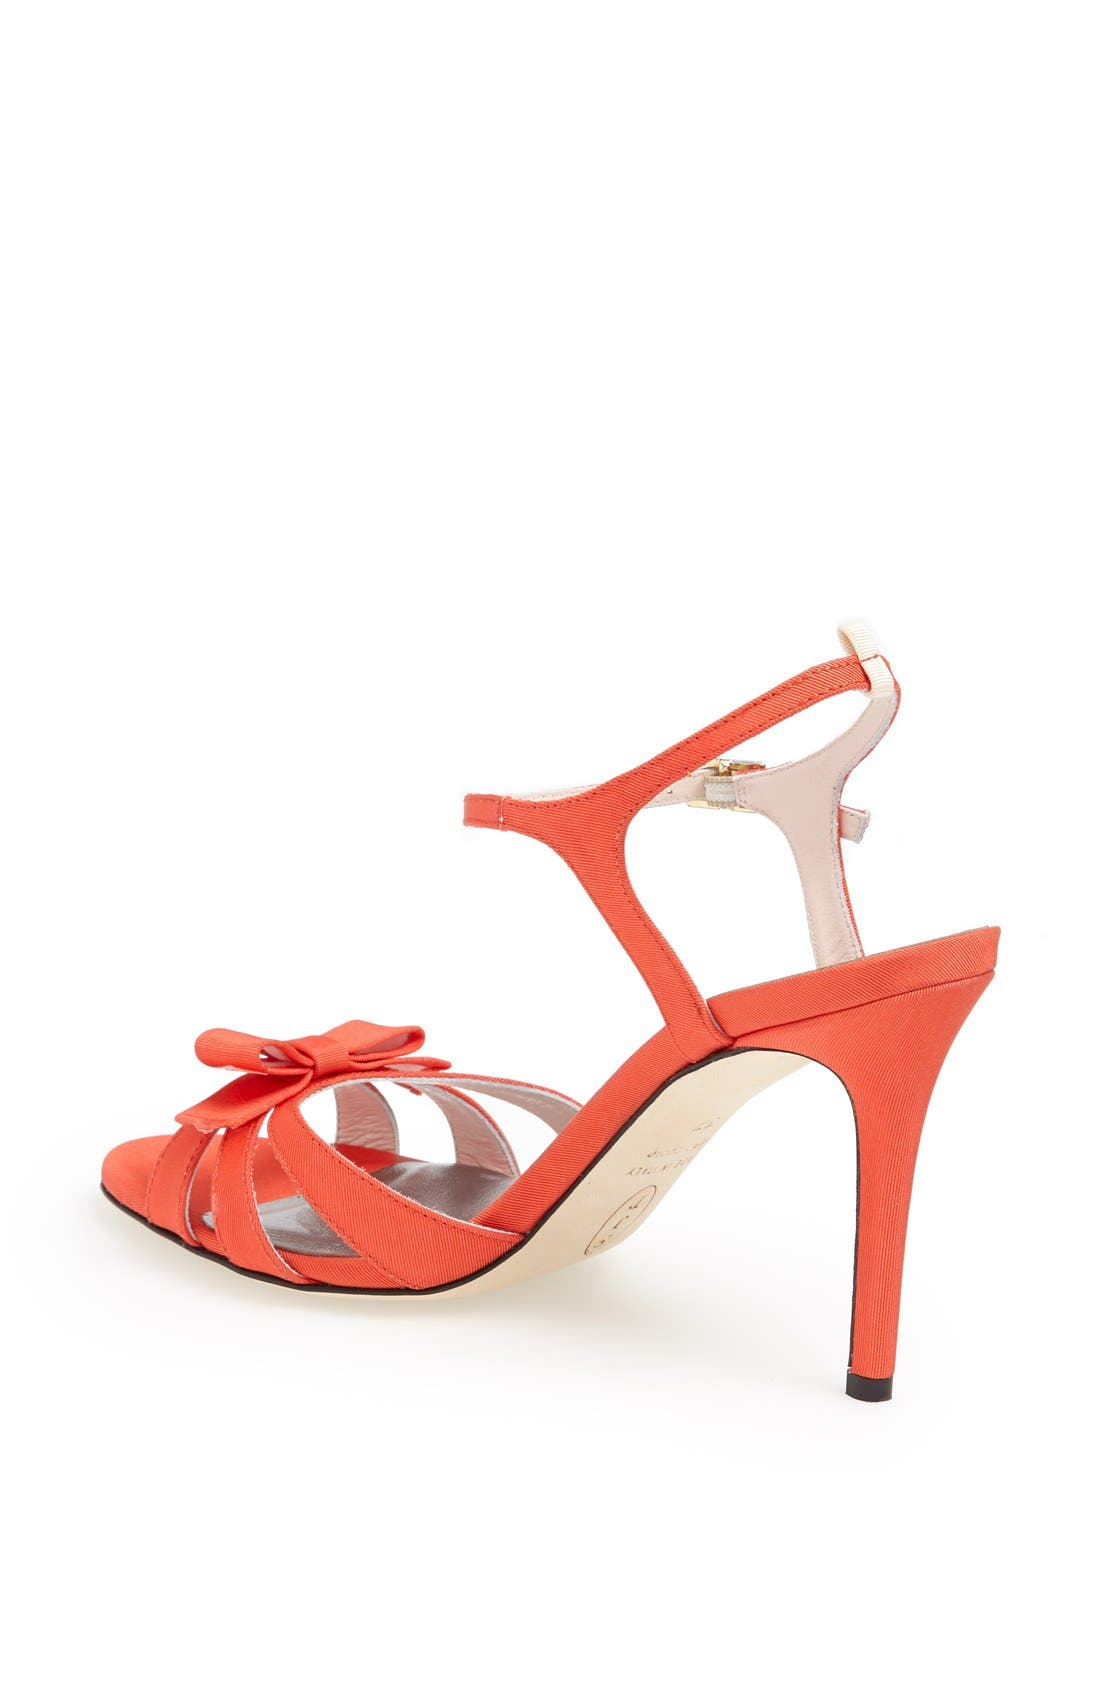 Alternate Image 2  - SJP 'Silvia' Grosgrain Ankle Strap Sandal (Nordstrom Exclusive)